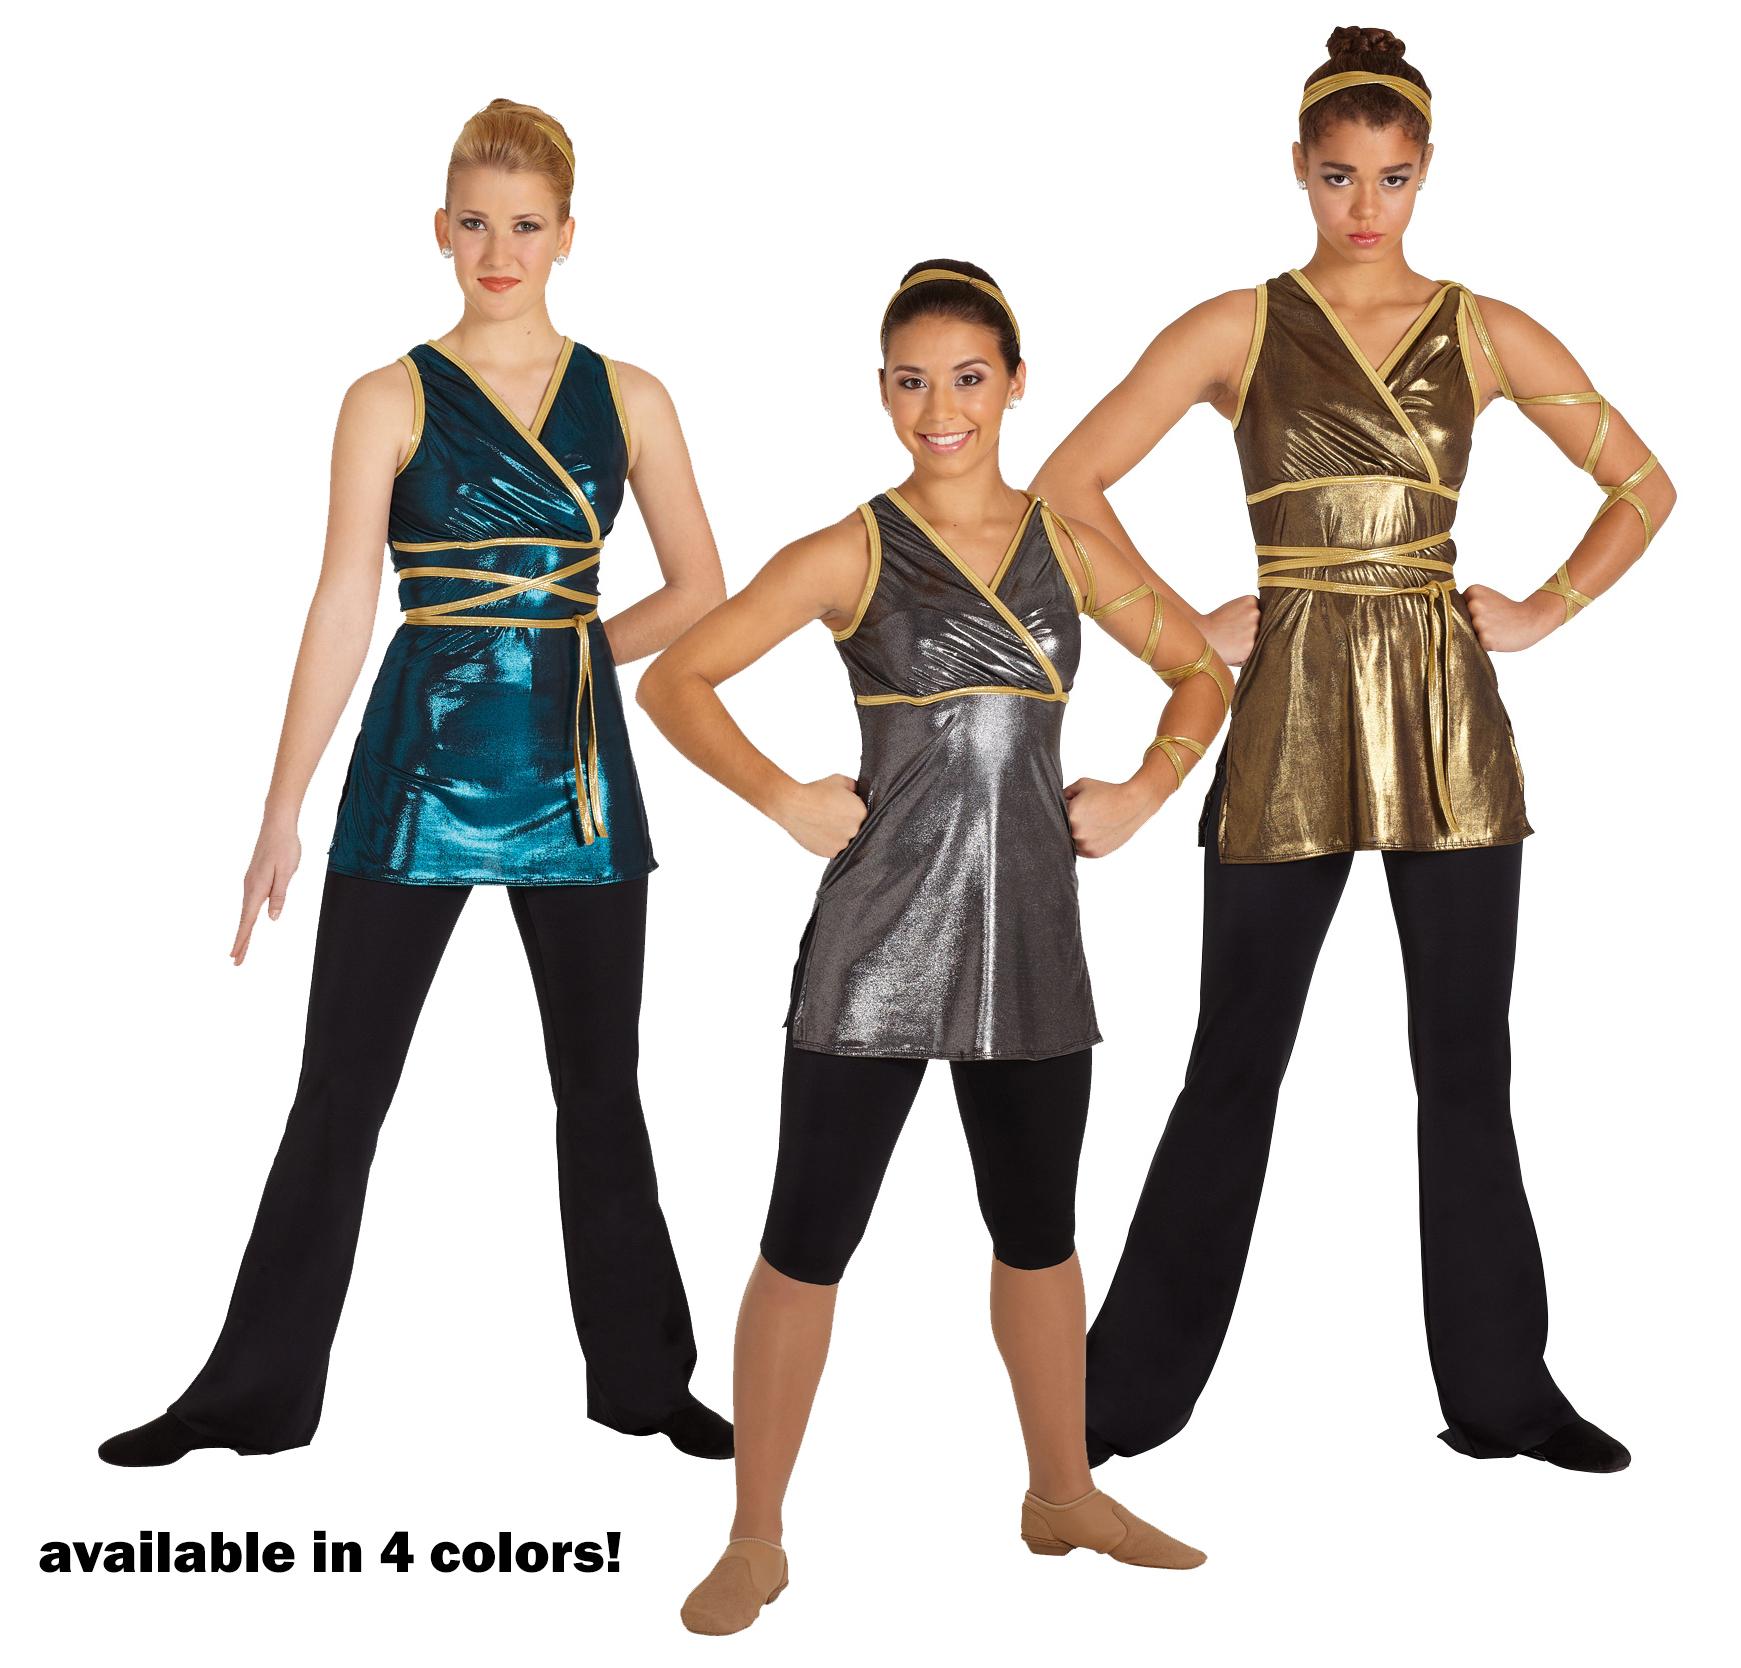 Guard Uniforms: Fantasia